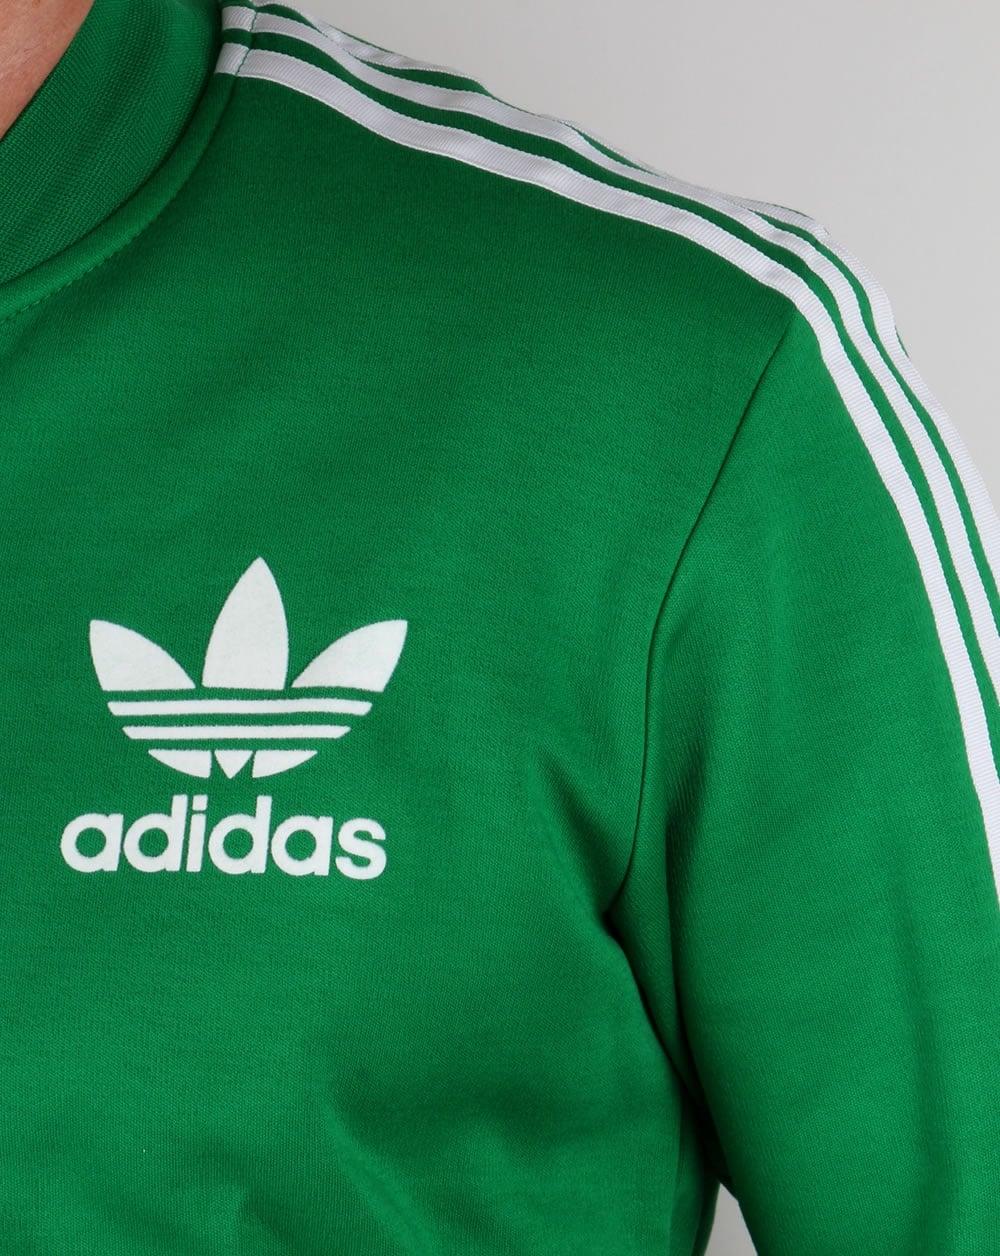 Adidas Originals Superstar Track Top Green/White, Tracksuit,Adicolour